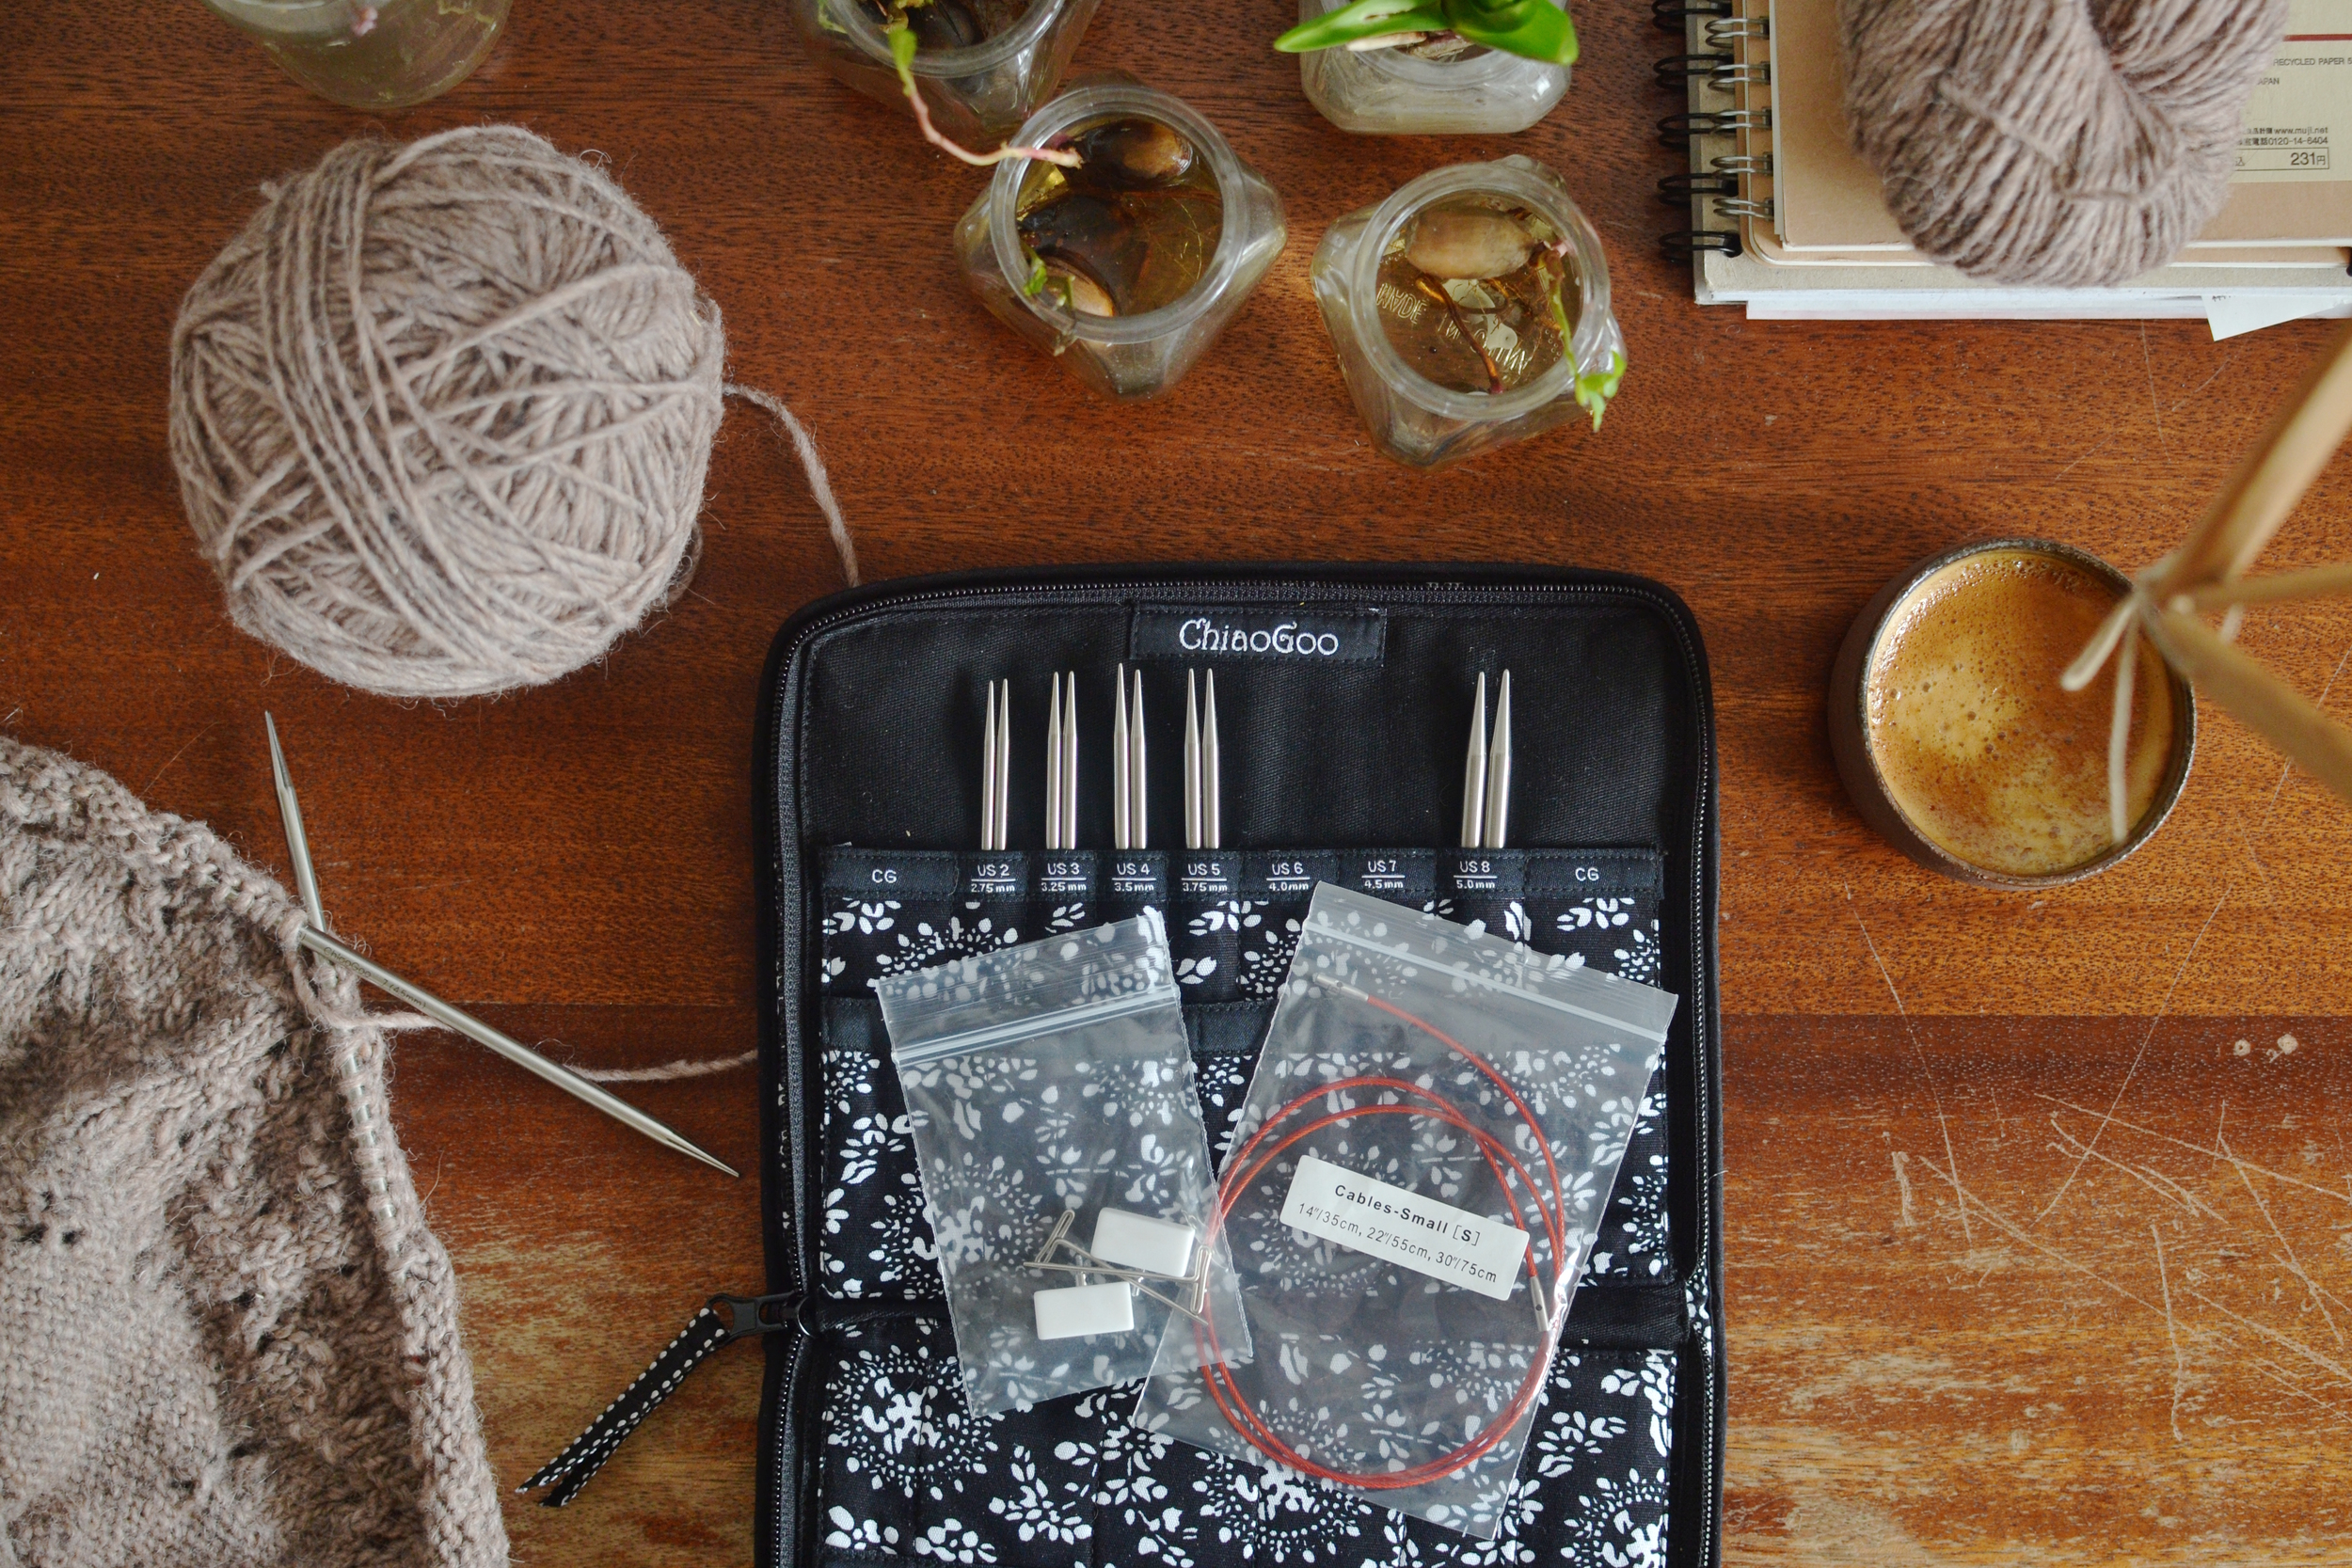 Chiagoo circualr needles kit review / Mandarine's